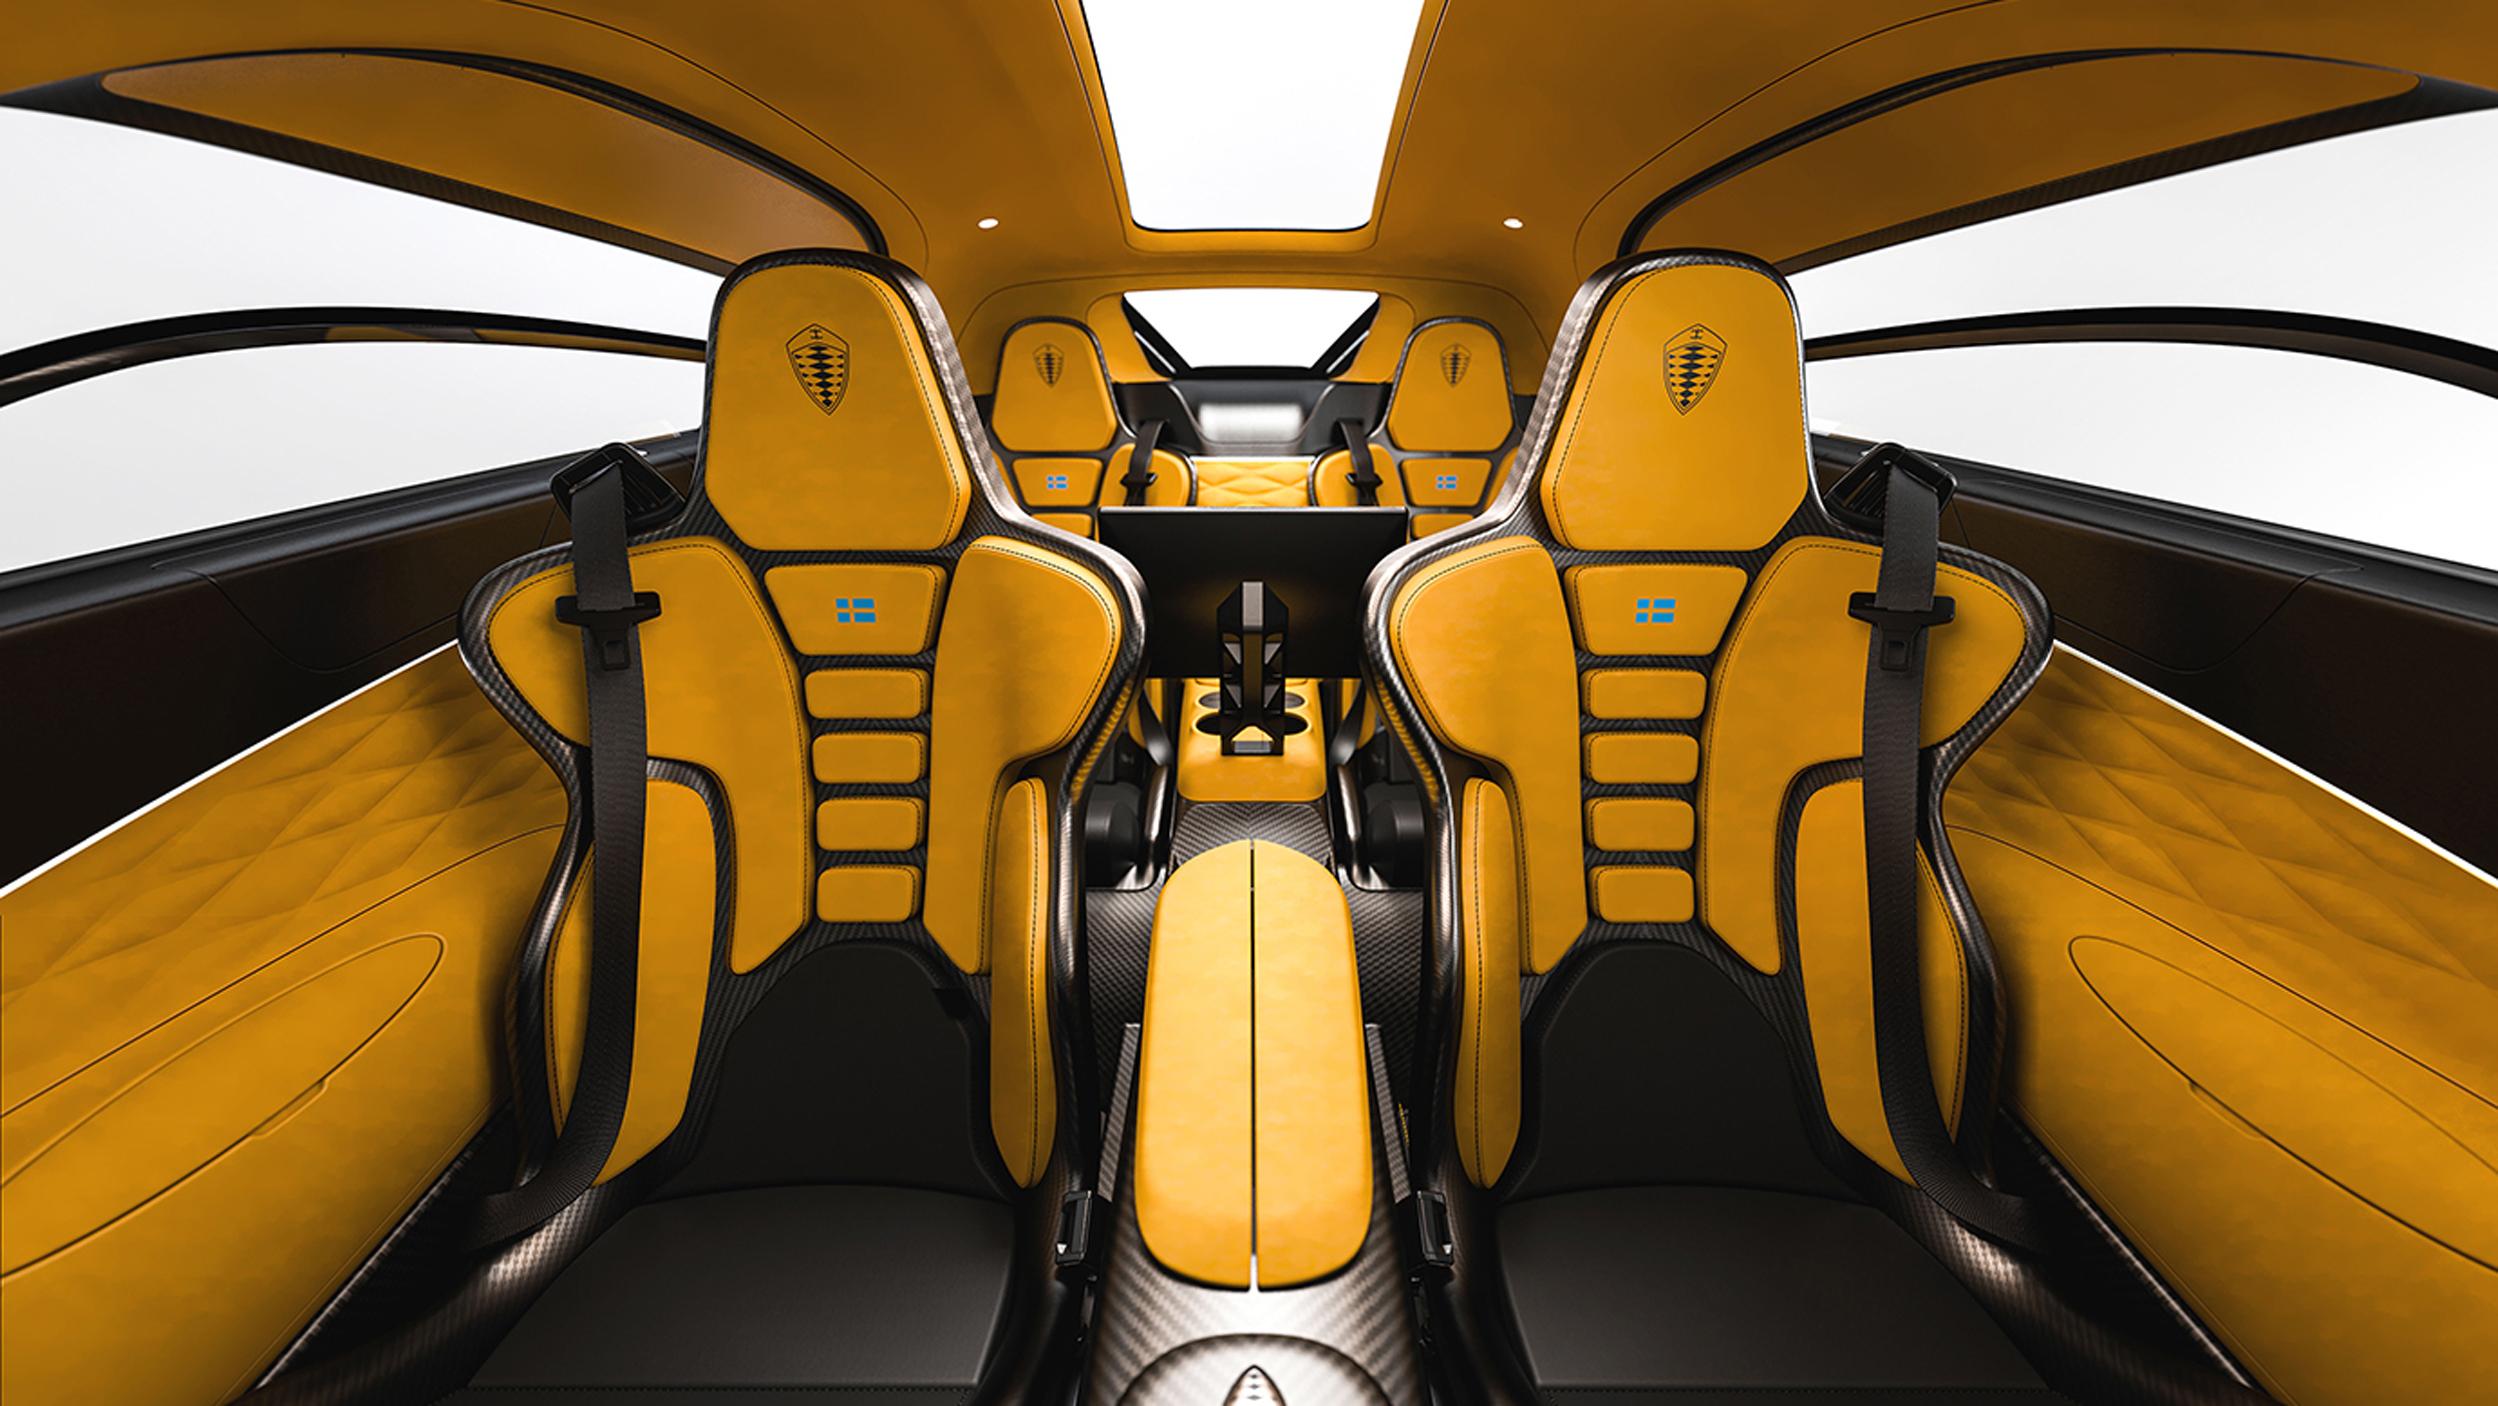 Koenigsegg Gemera-GIMS2020-interiores 4 plazas